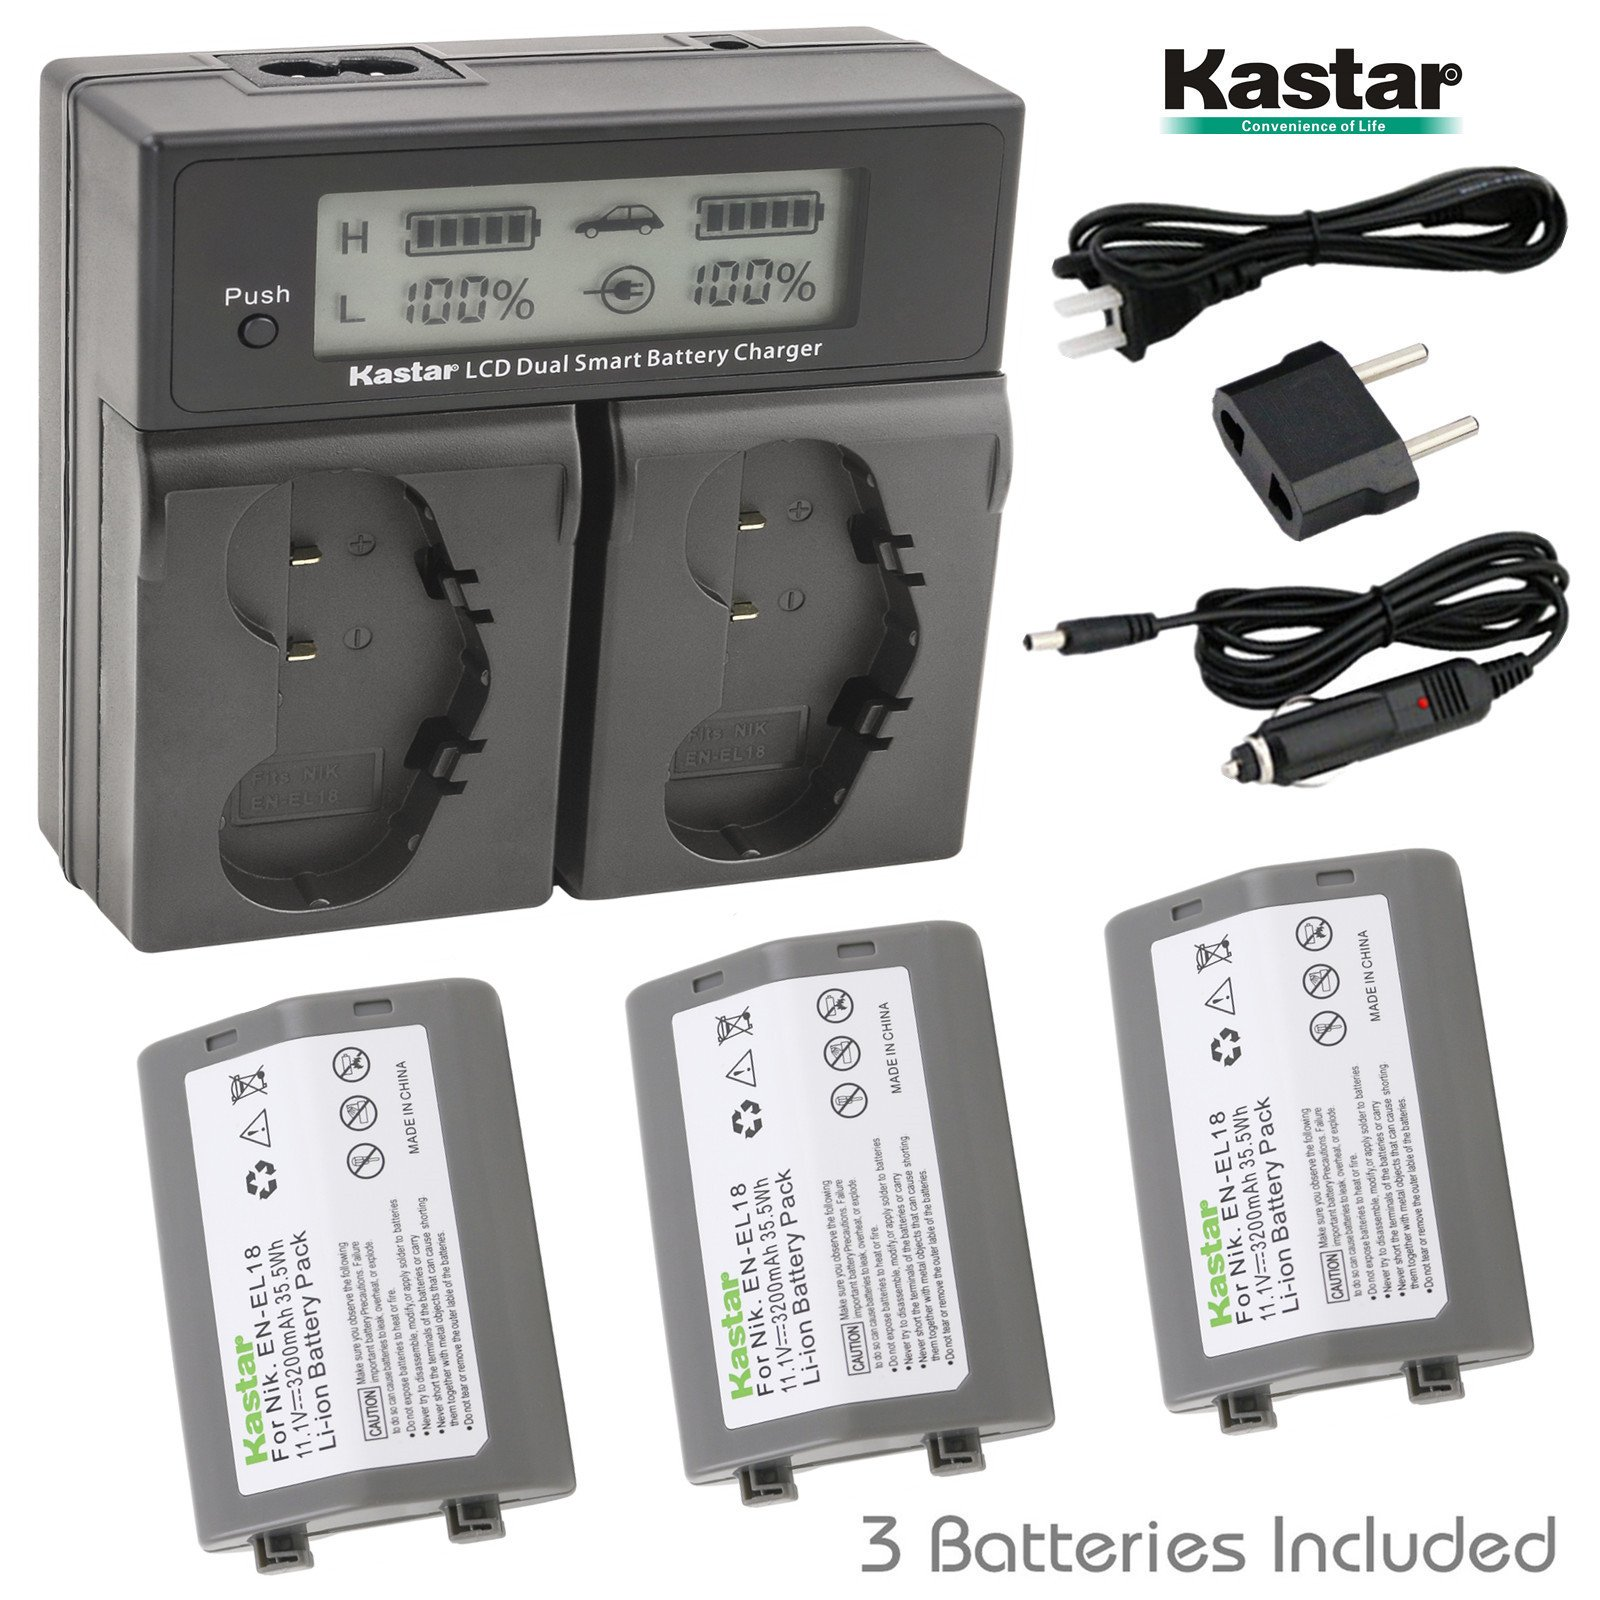 Kastar LCD Dual Smart Fast Charger & Battery (3 PACK) for Nikon EN-EL18, EN-EL18a, ENEL18, ENEL18a, MH-26, MH-26a, MH26 and Nikon D4, D4S, D5 Digital SLR Camera, Nikon MB-D12, D800, D800E Battery Grip